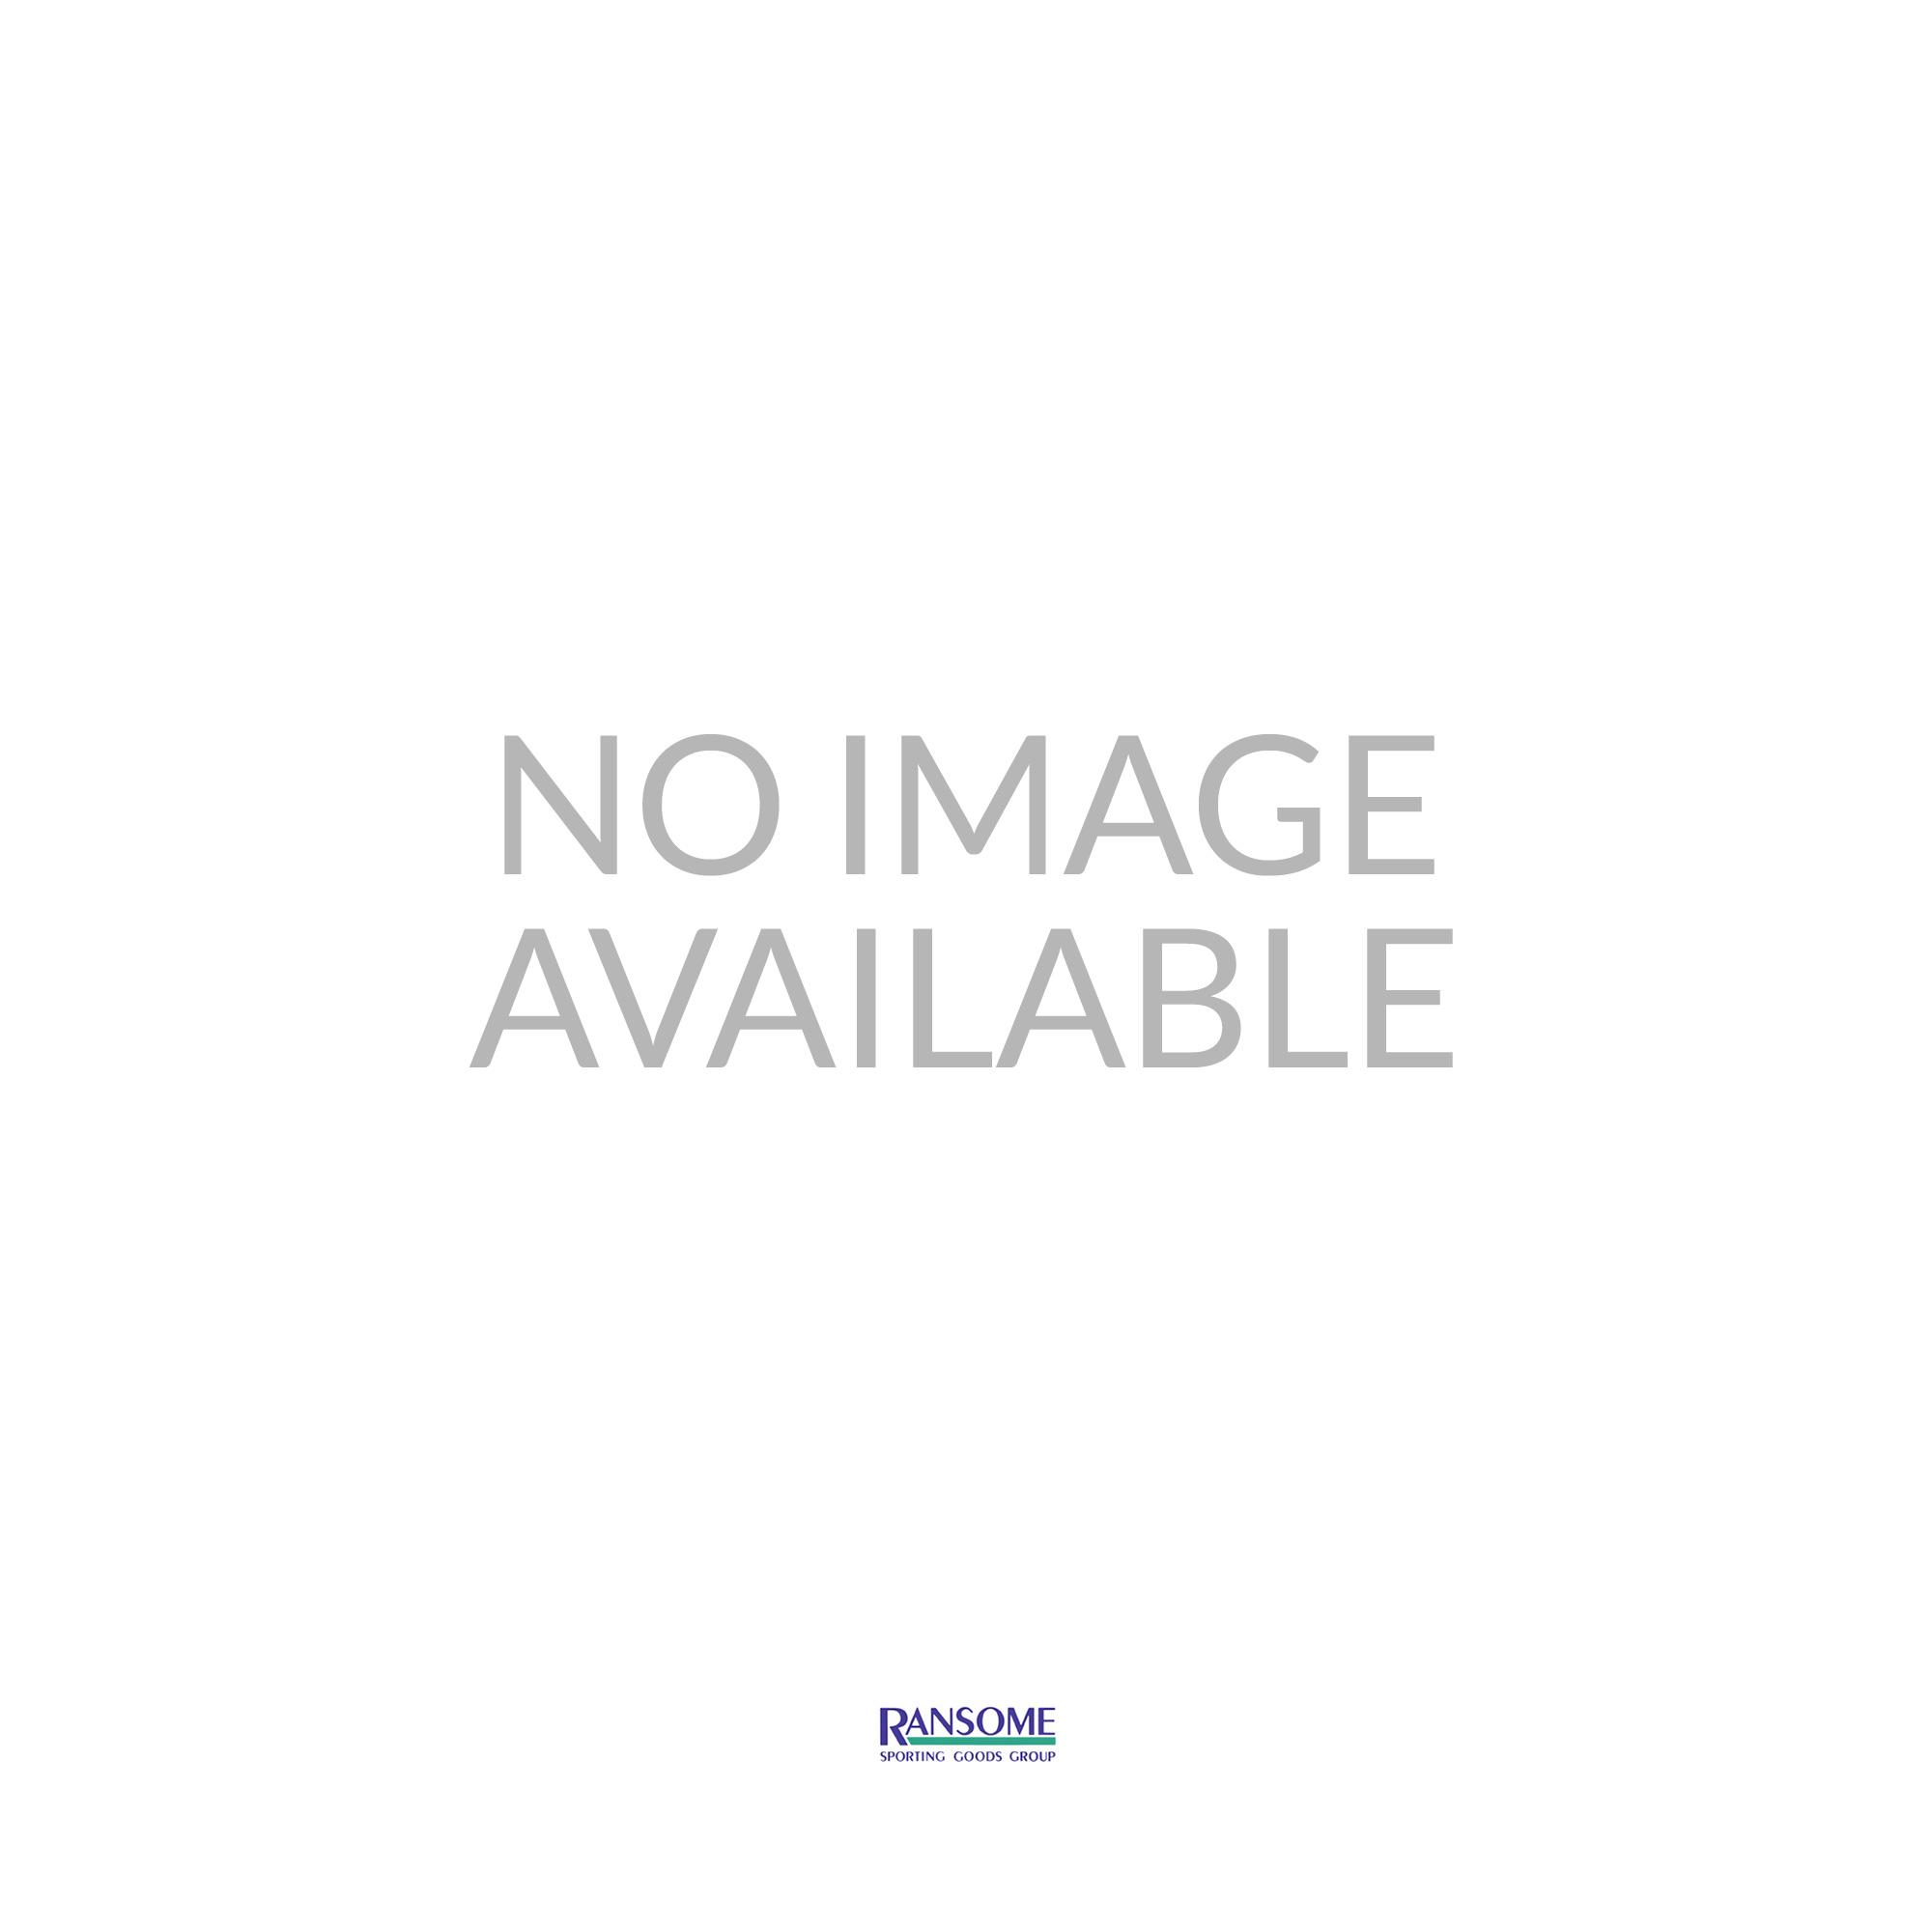 Replacement Fixed Net & Post Set for Deluxe Indoor and Deluxe Outdoor Rollaway Tables